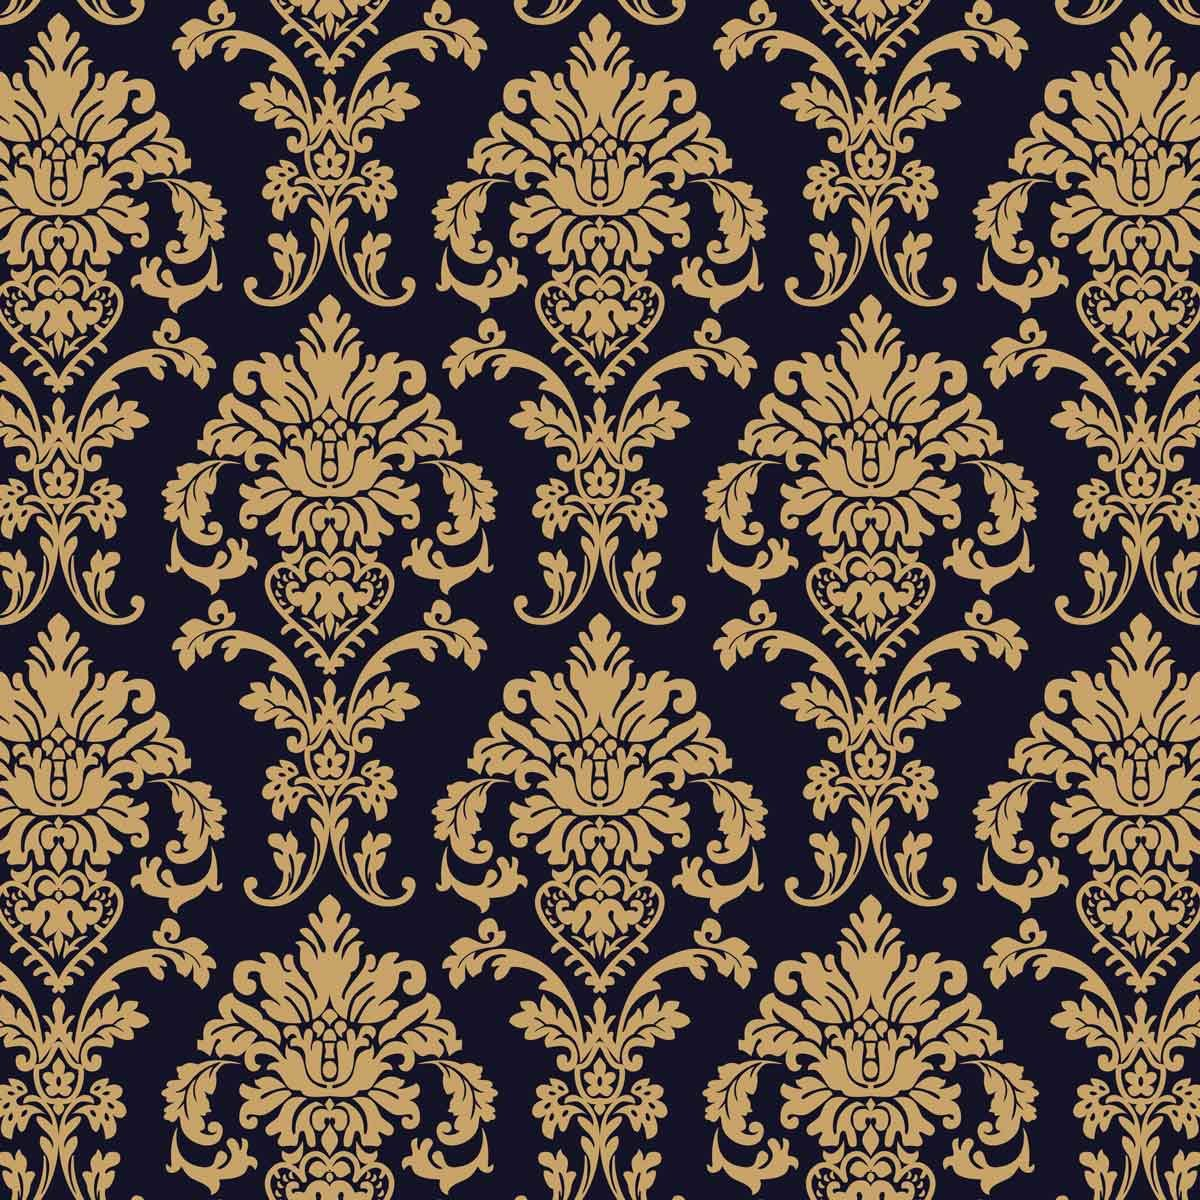 Black and Gold Damask-Pattern